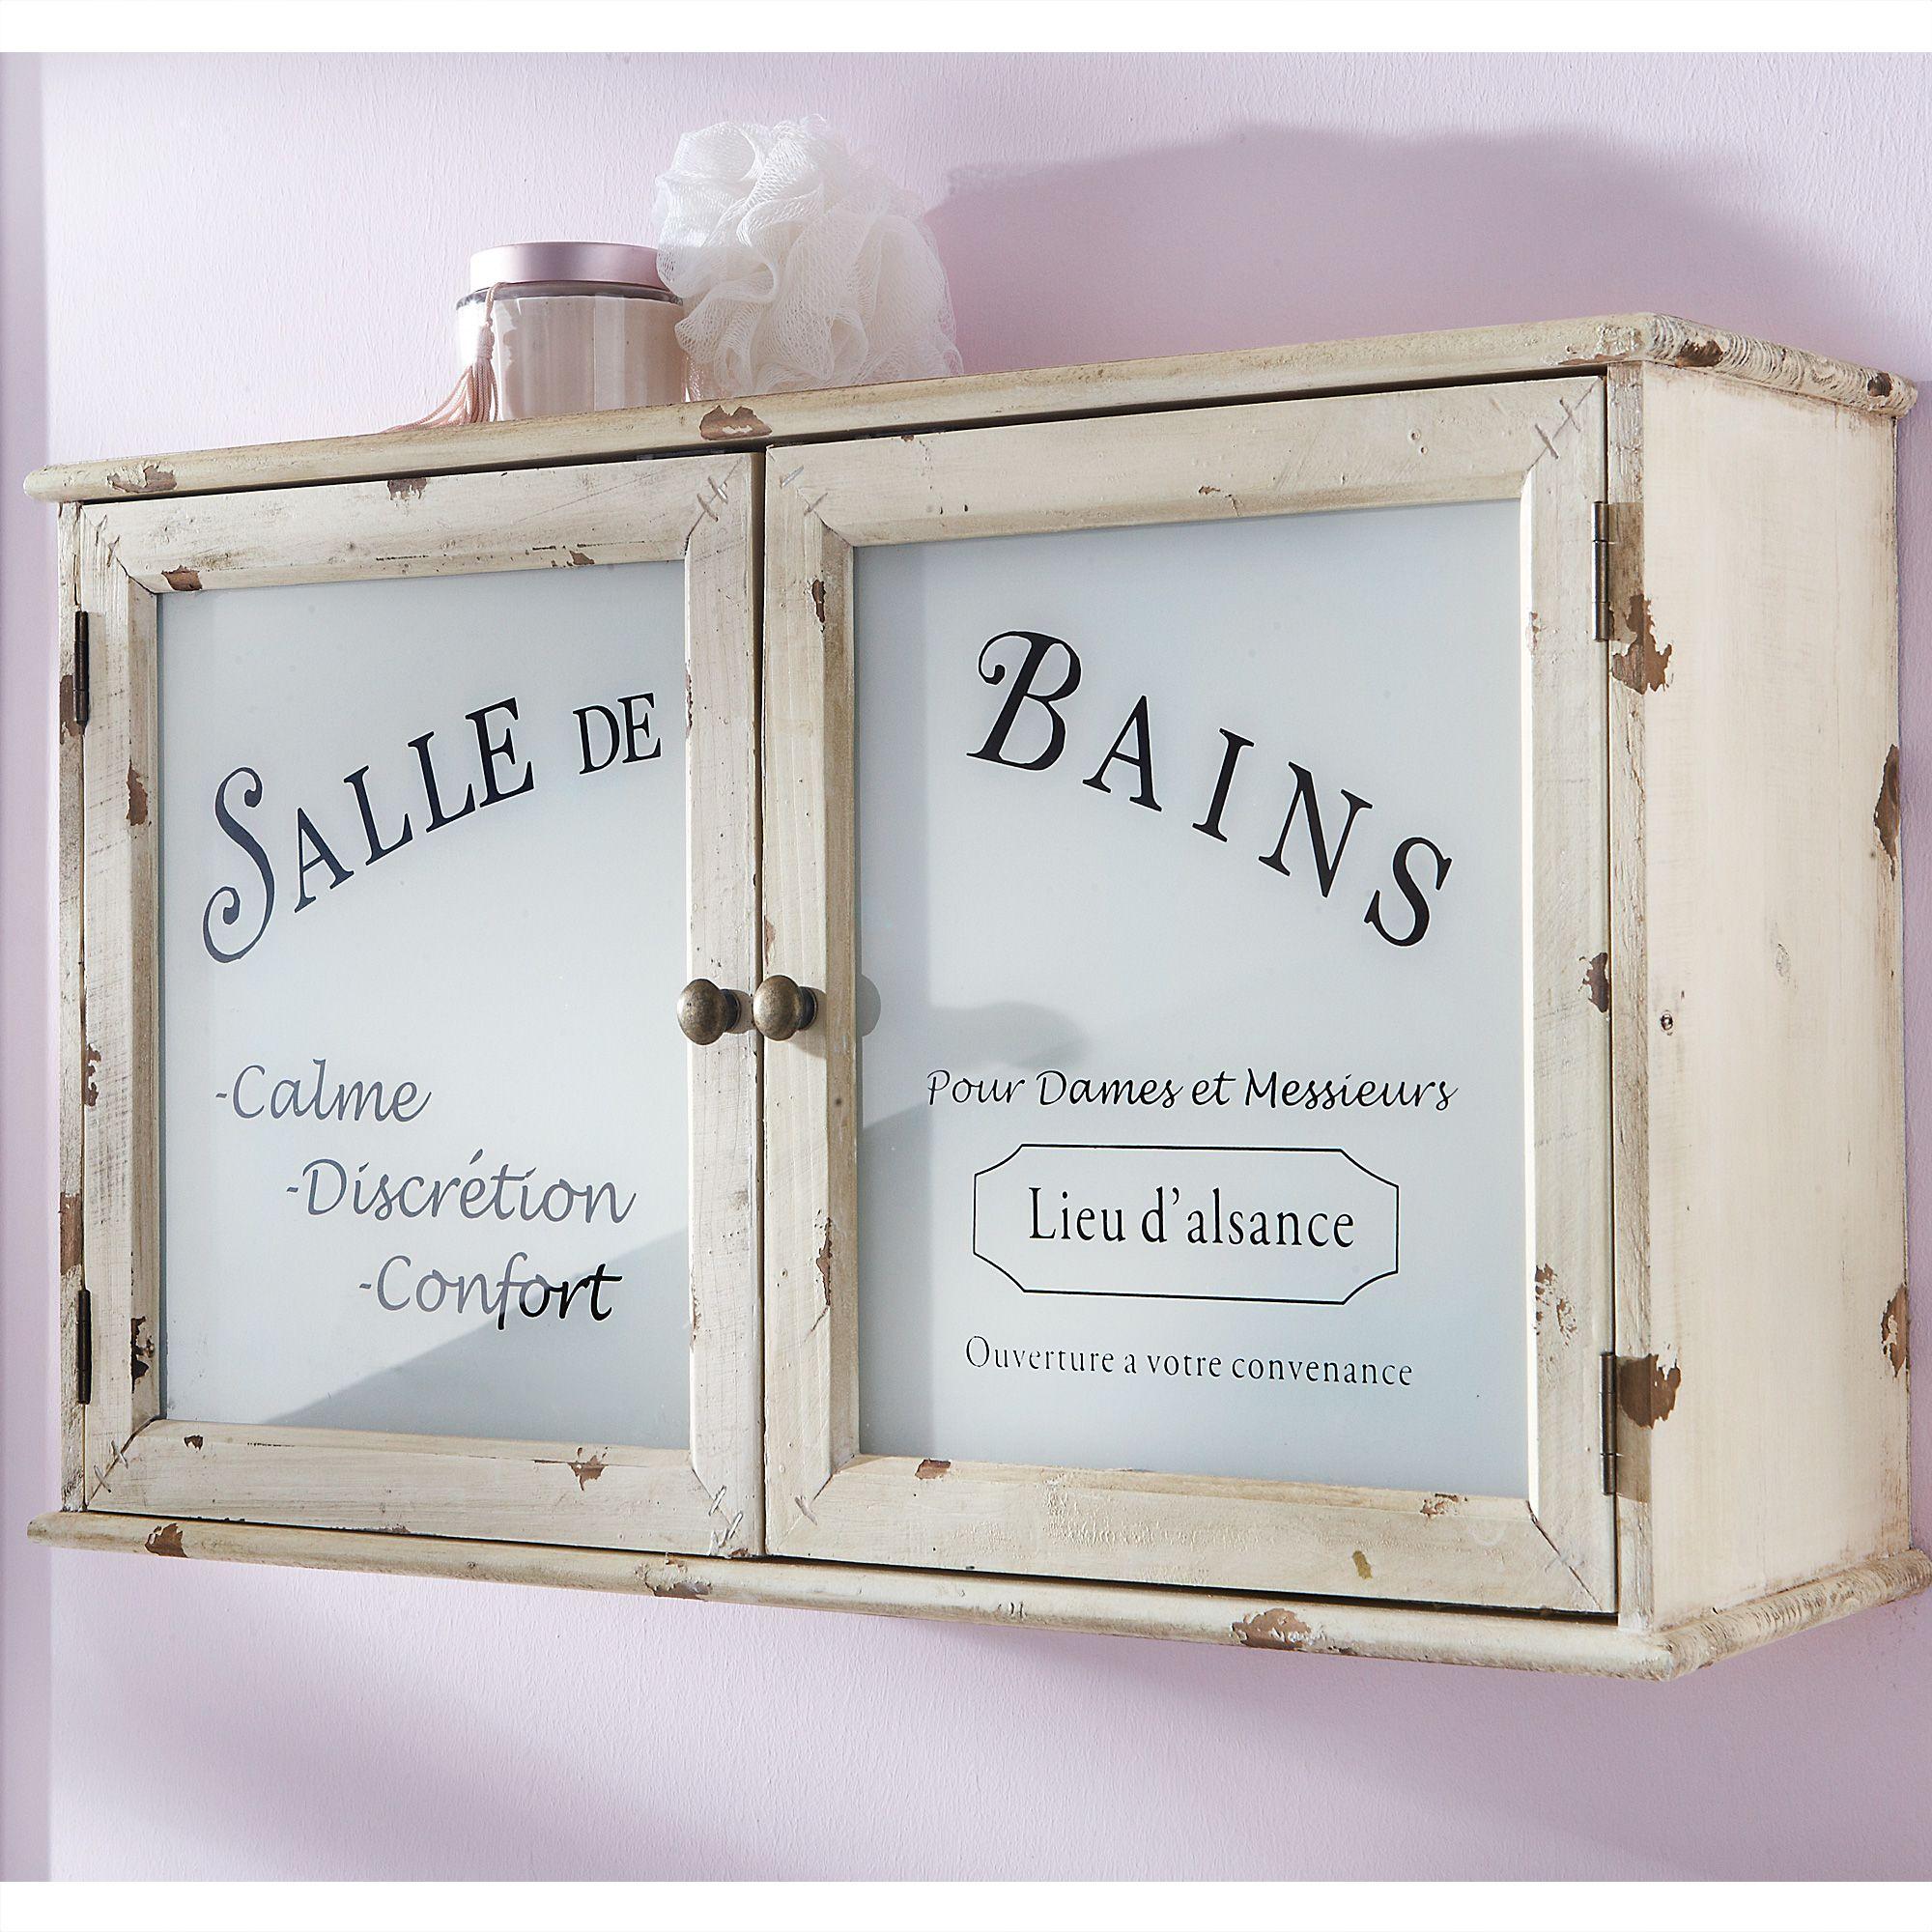 Waschbeckenunterschrank Vintage : medicine chest, seen on gingarde  Tell the world I´m coming home